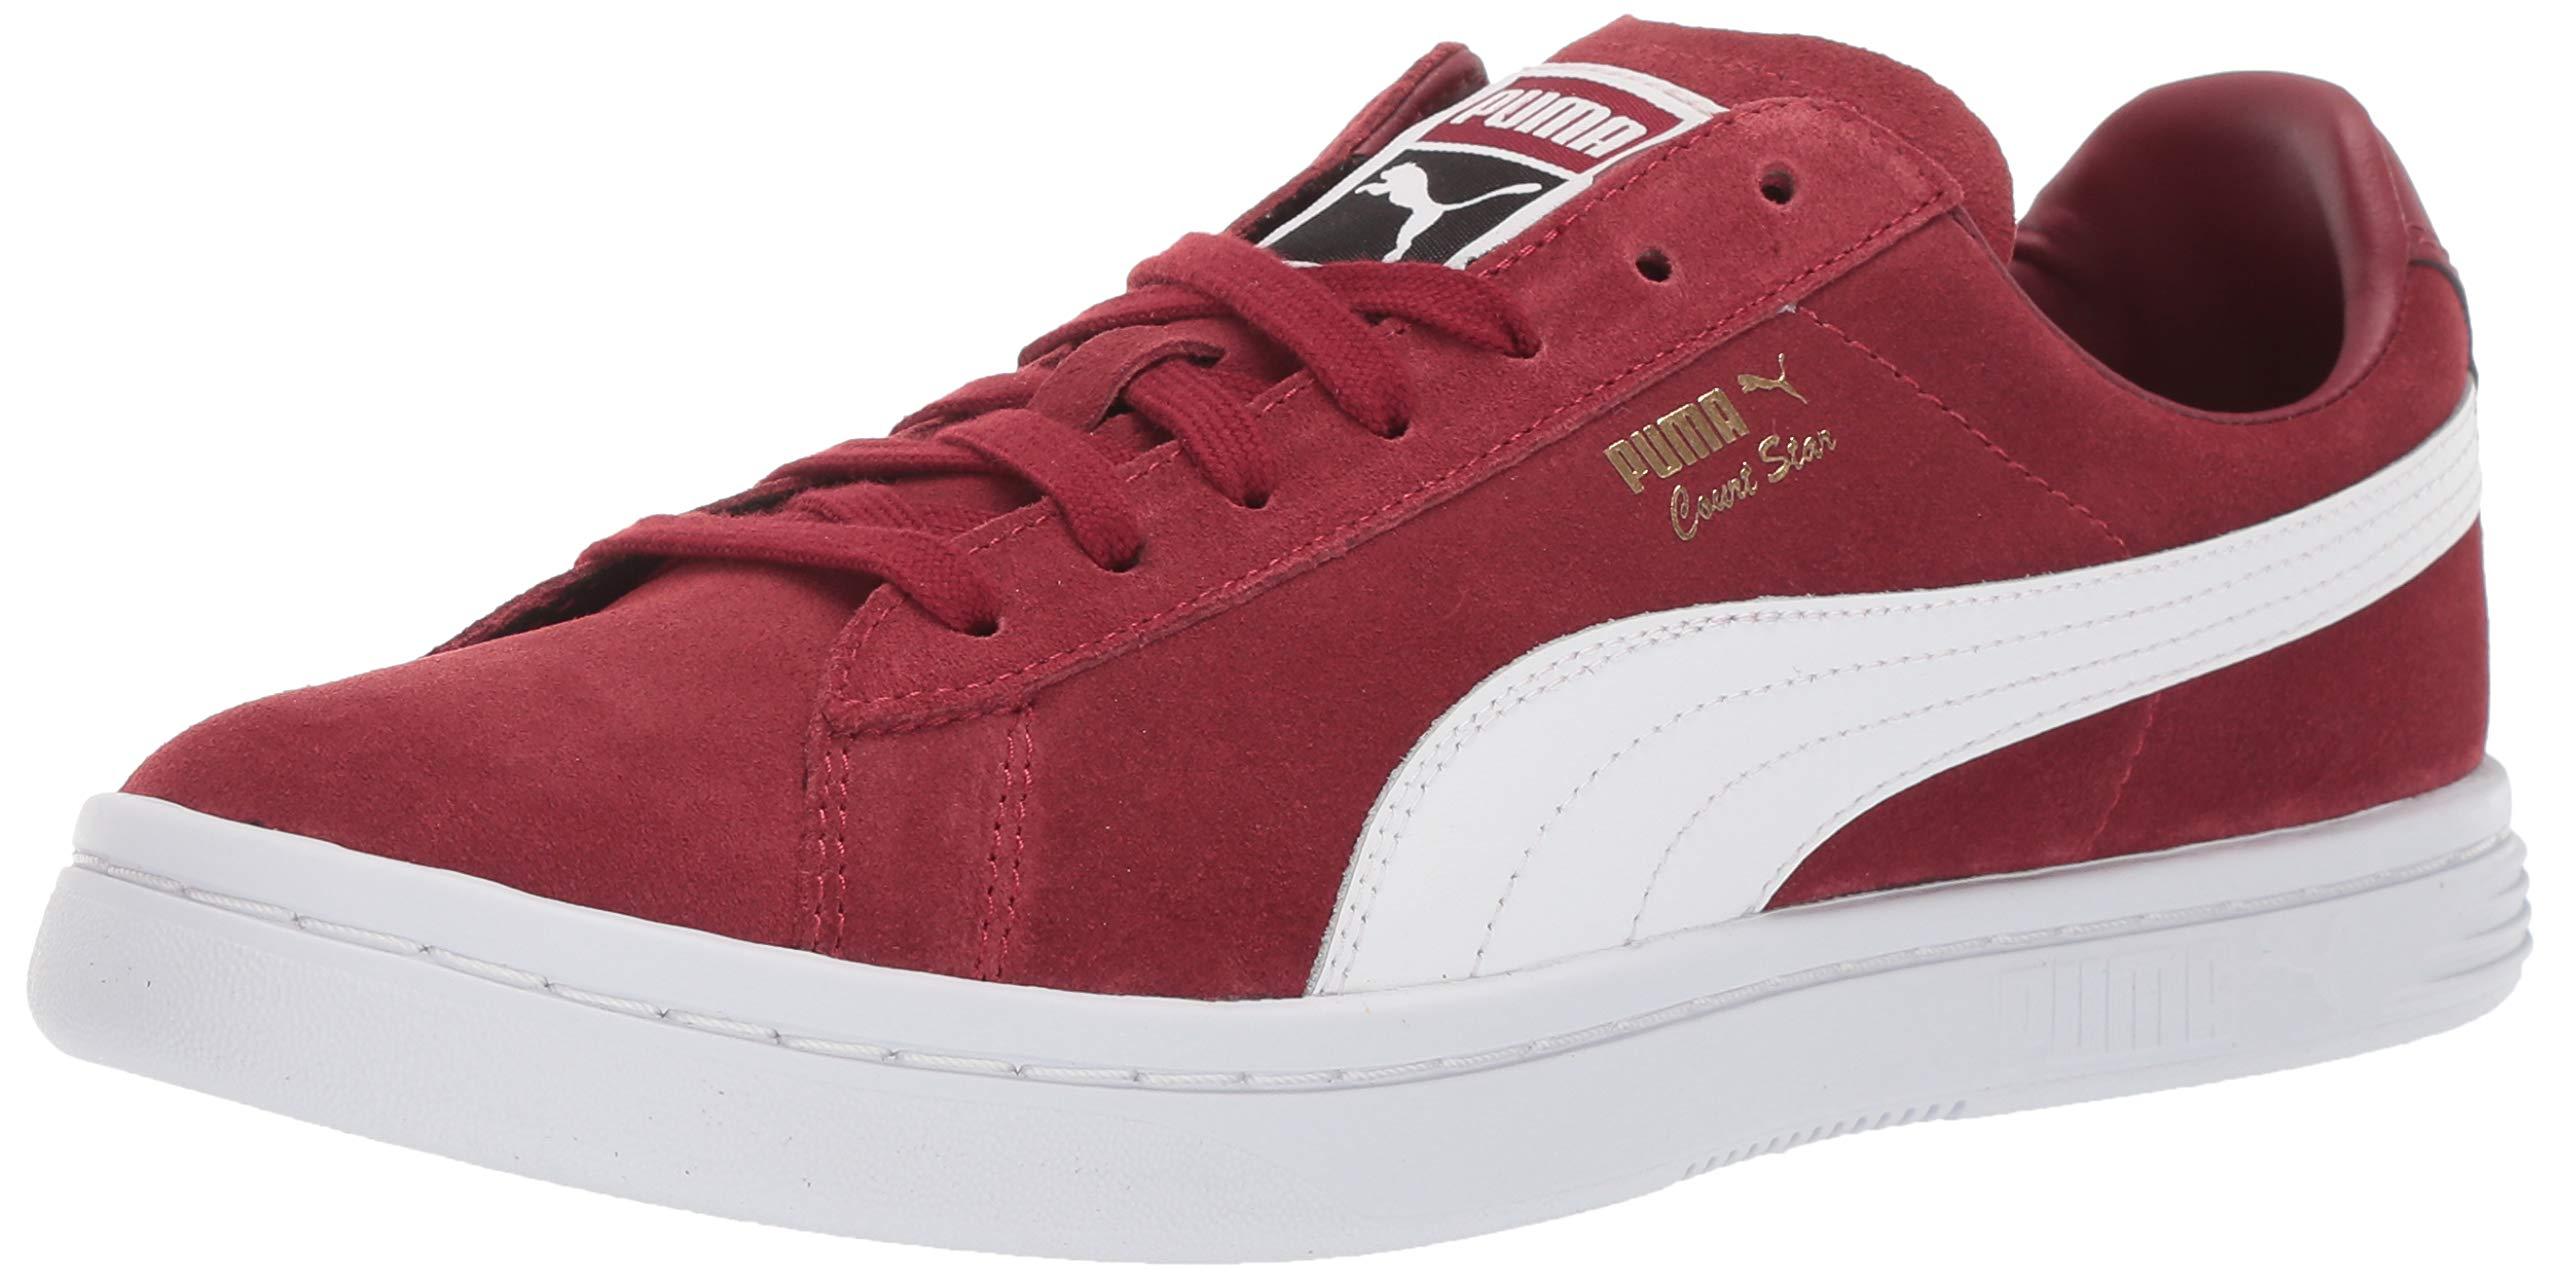 PUMA Men's Court Star Sneaker- Buy